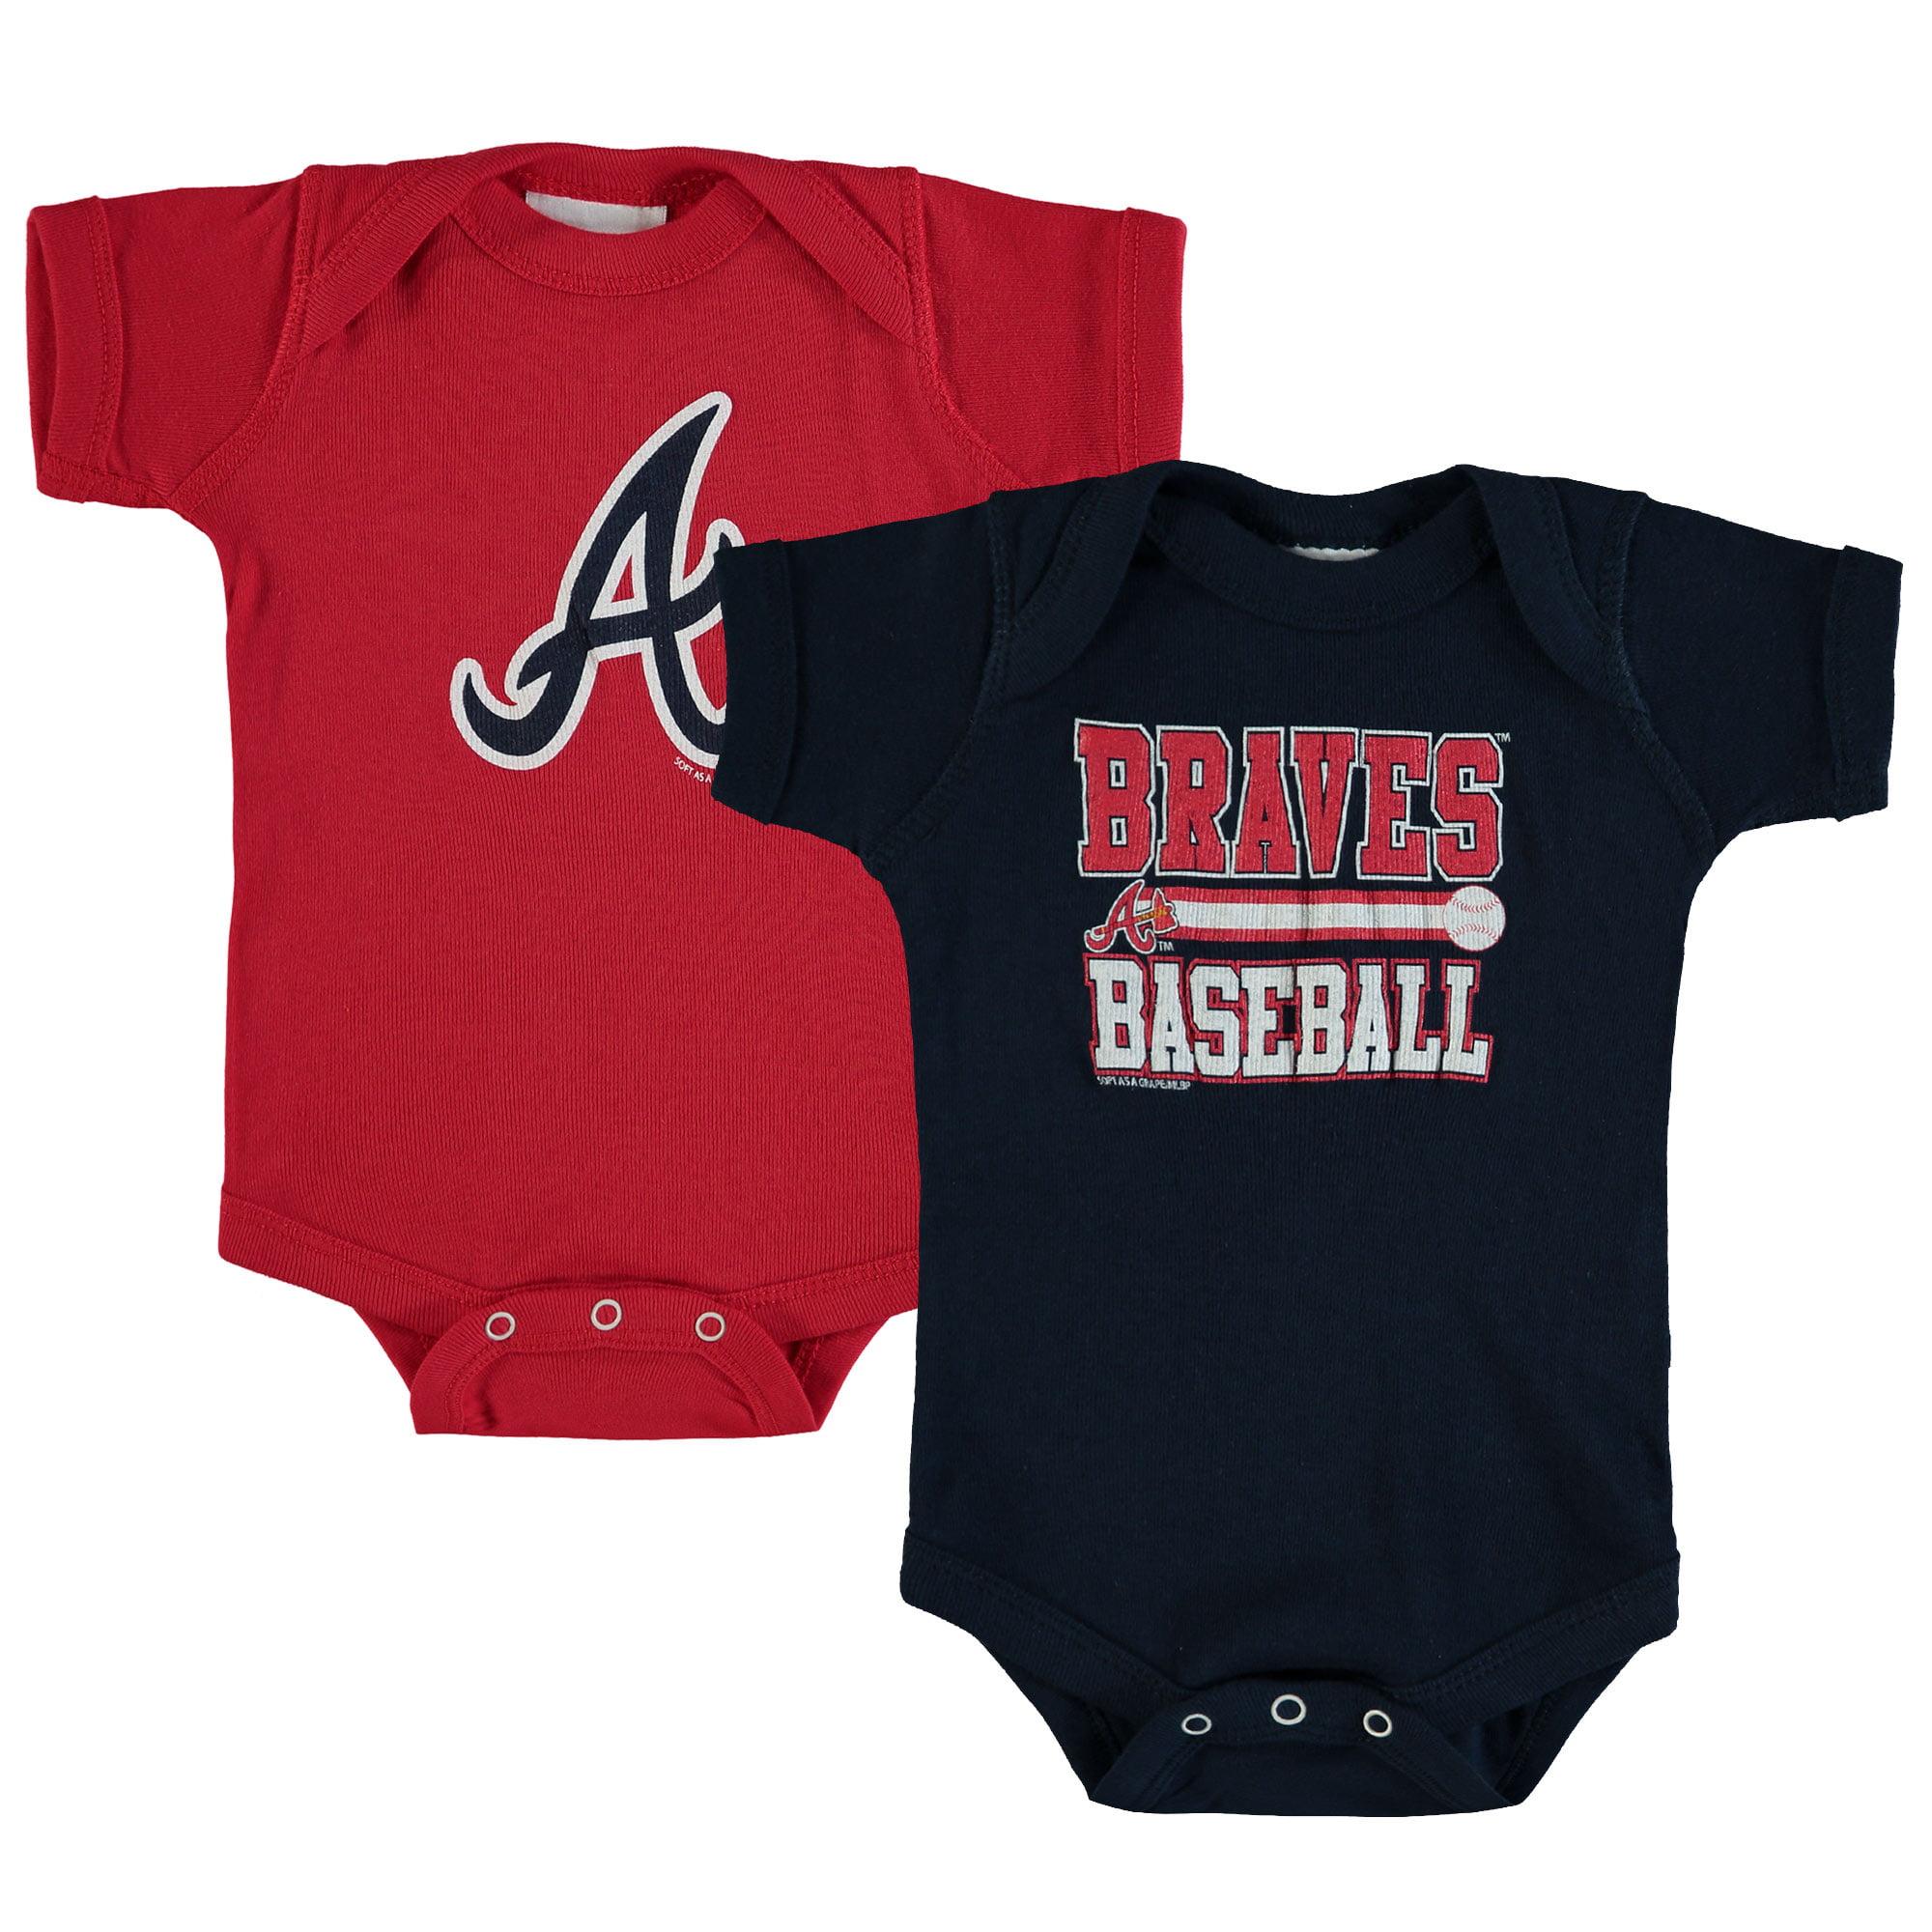 Atlanta Braves Soft as a Grape Newborn & Infant 2-Piece Body Suit - Navy/Red